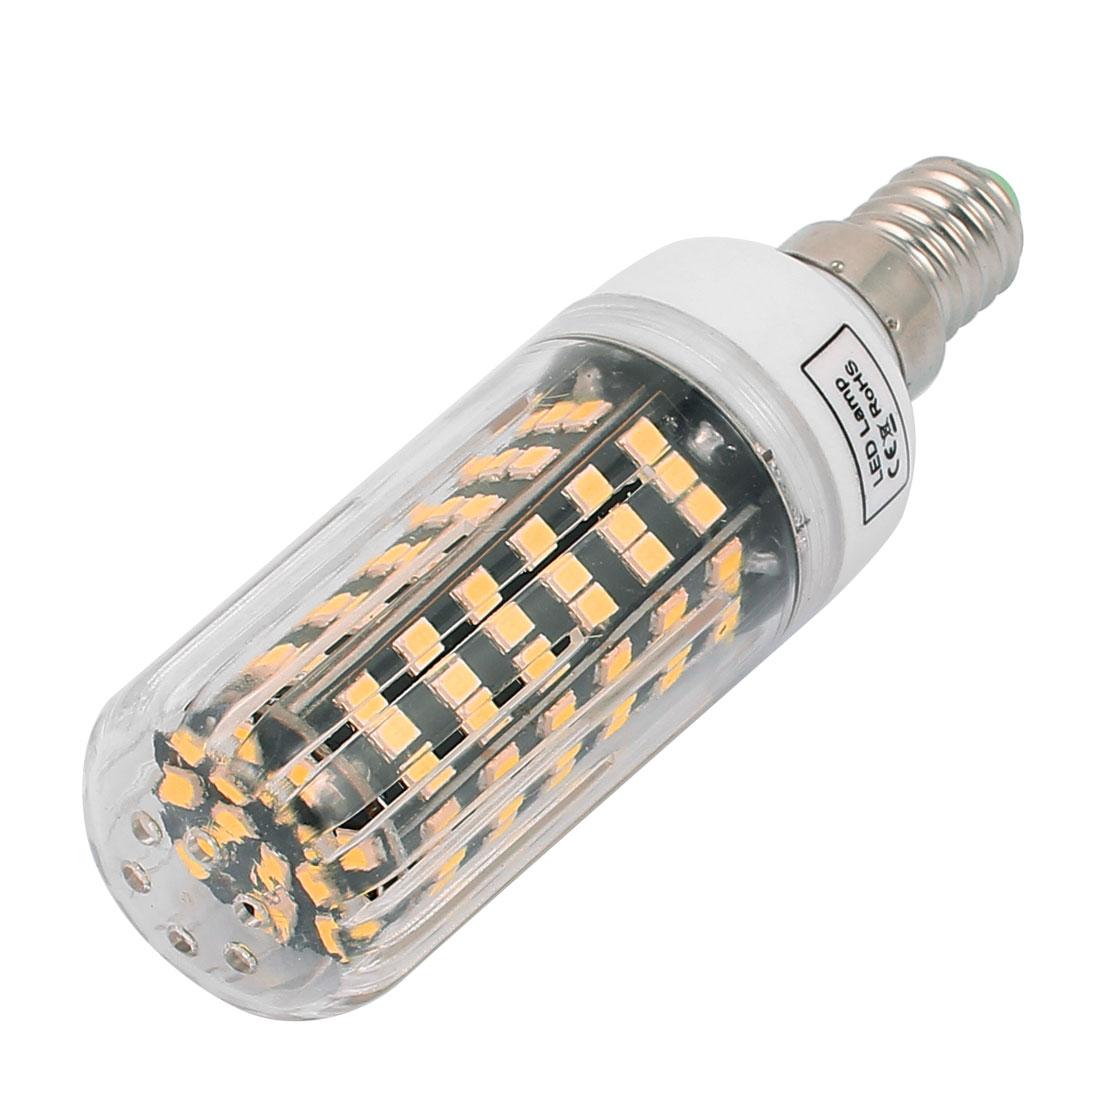 AC220V 9W 123 x 2835SMD E14 LED Corn Bulb Light Lamp Energy Saving Warm White